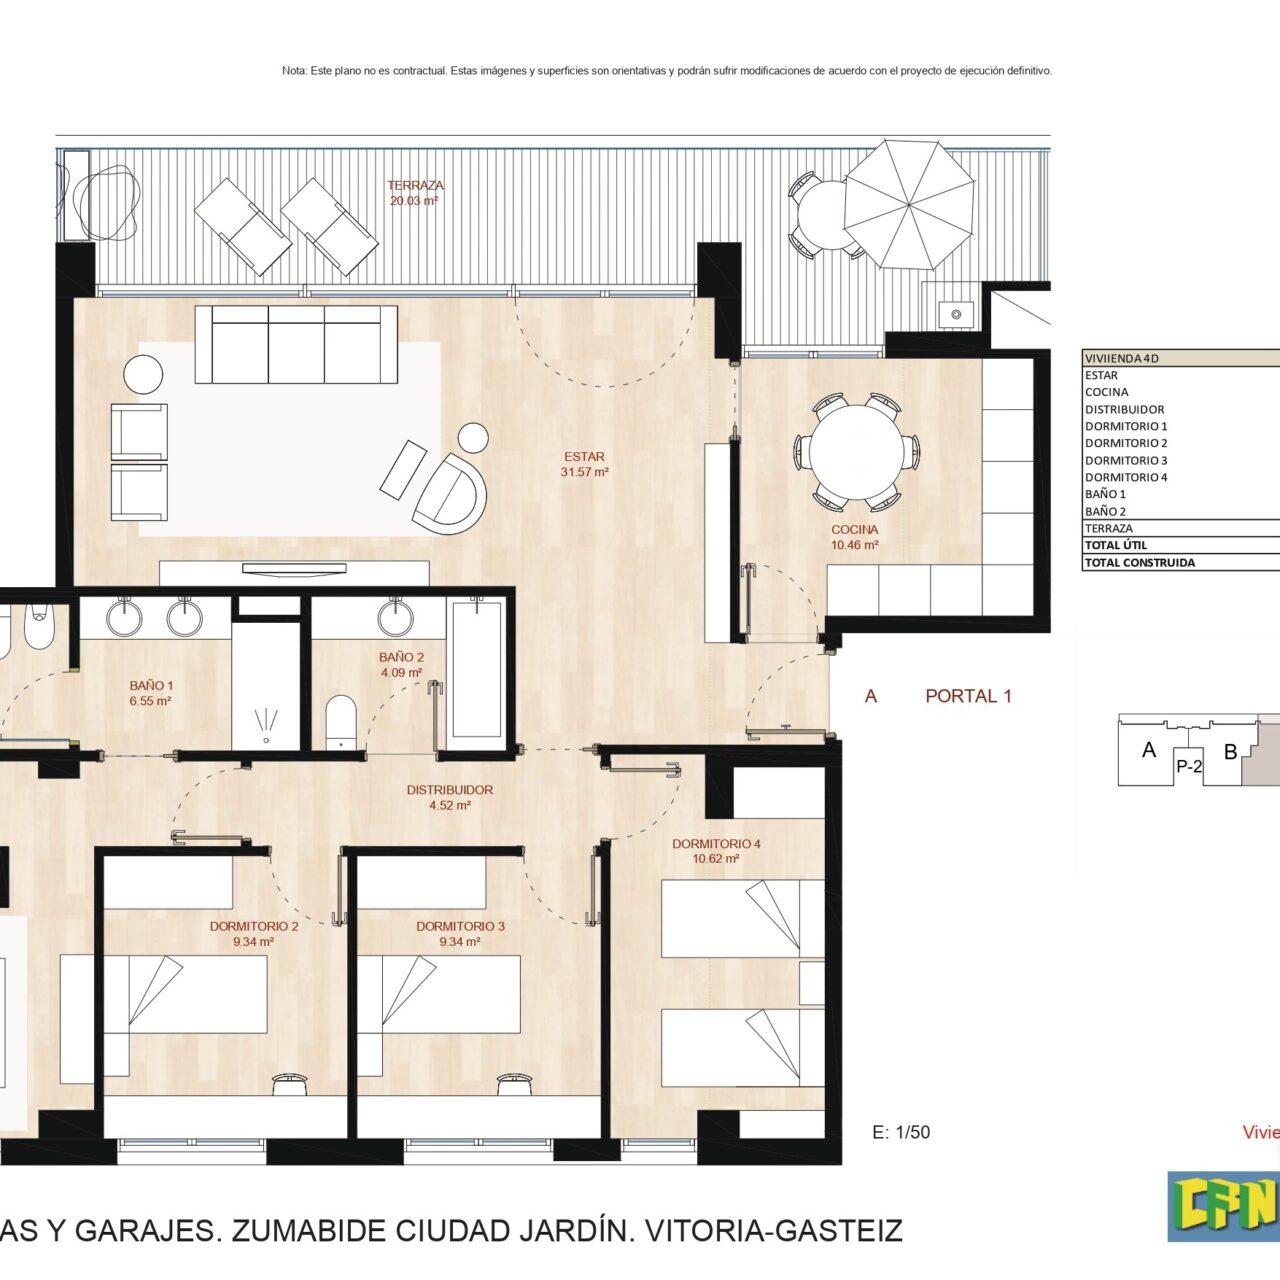 http://www.zumabideciudadjardin.com/wp-content/uploads/2021/06/4-Dormitorios-1280x1280.jpg